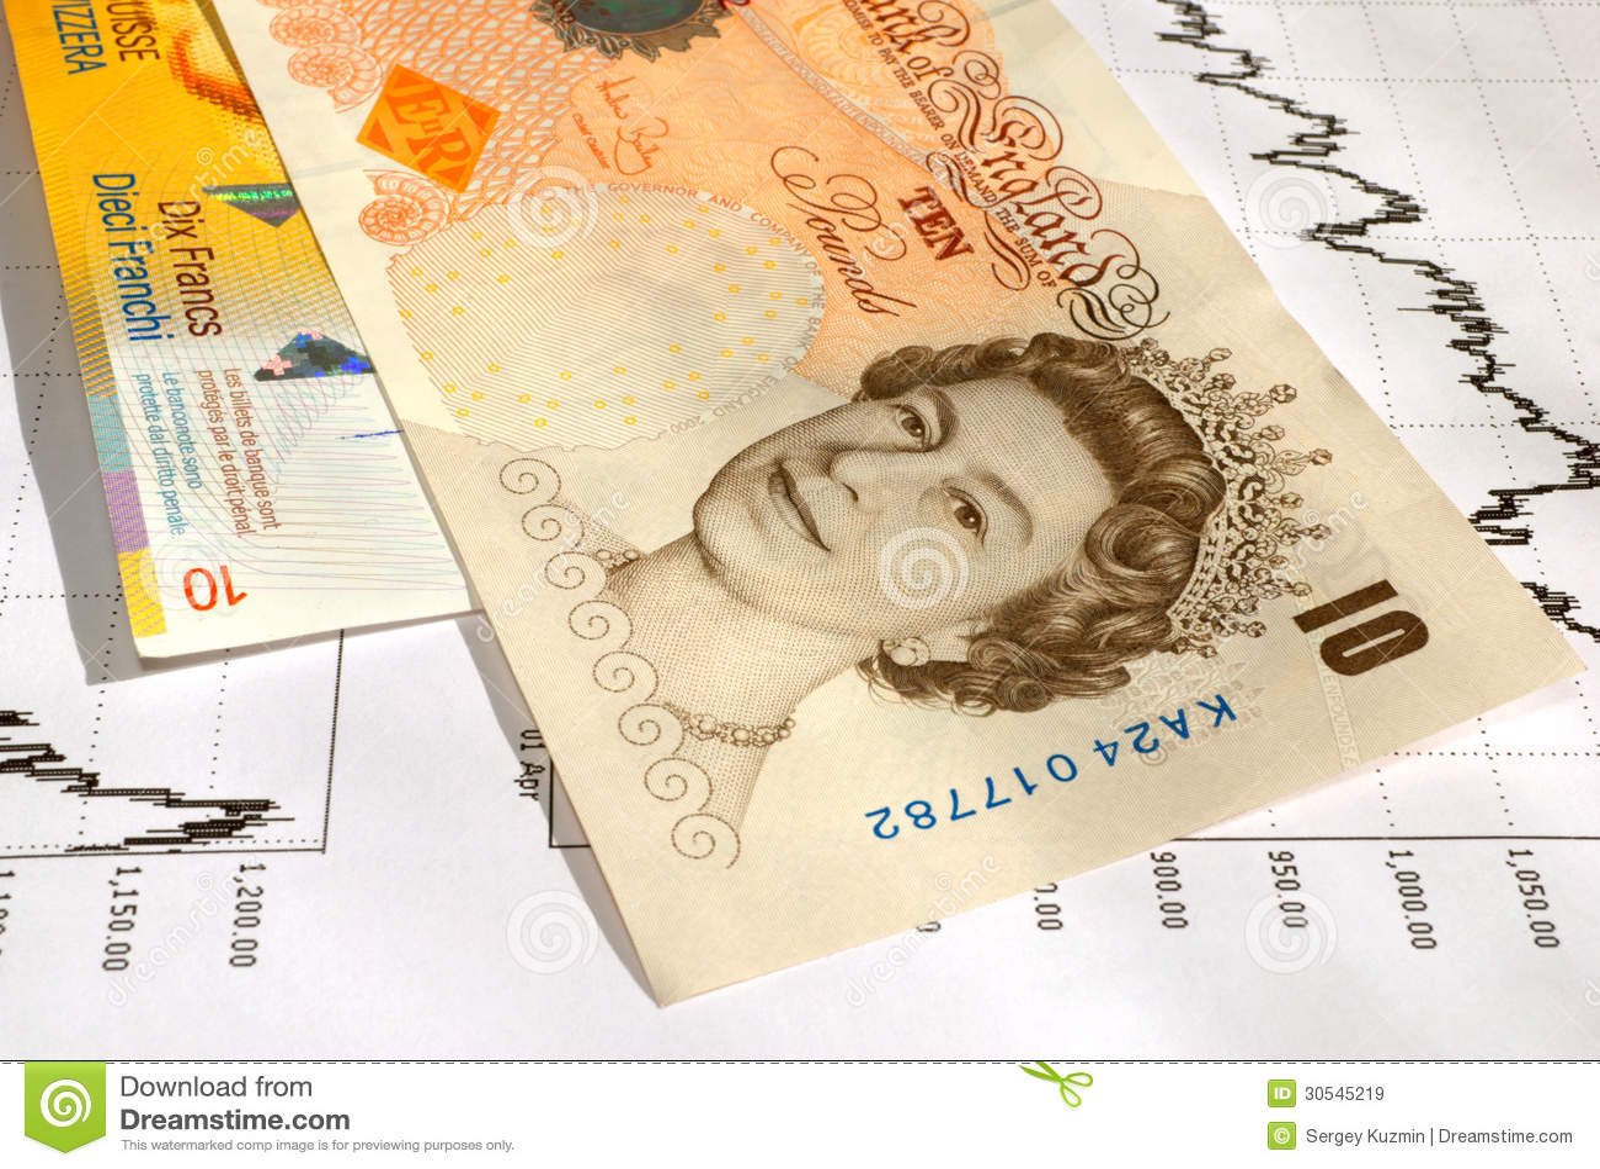 Gbp chf british pound swiss franc exchange rate editorial stock gbp chf british pound swiss franc exchange rate nvjuhfo Images